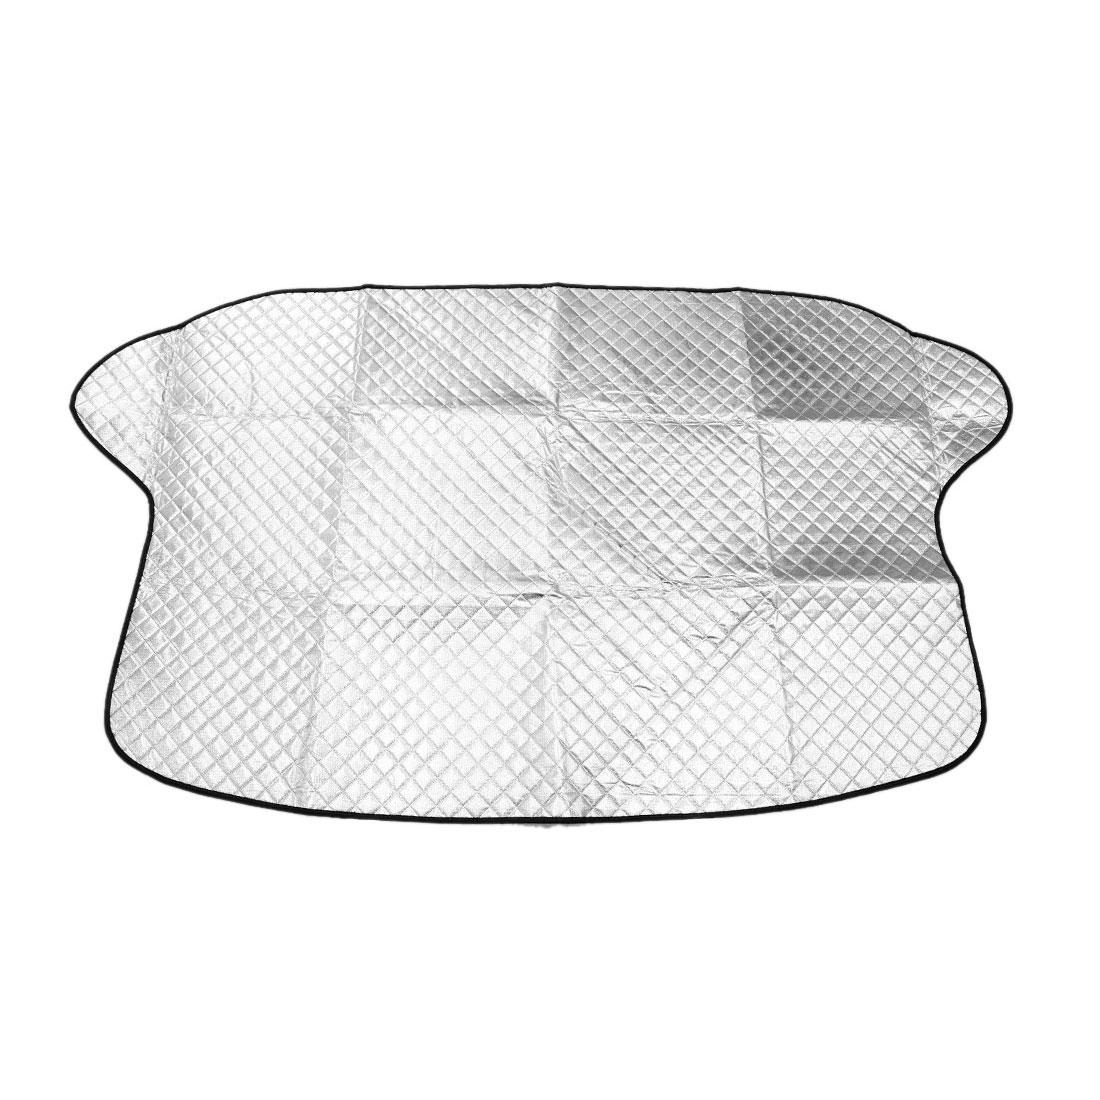 Foldable Car Auto Sun Visor Front Rear Window Snow Shield Shade Cover Block